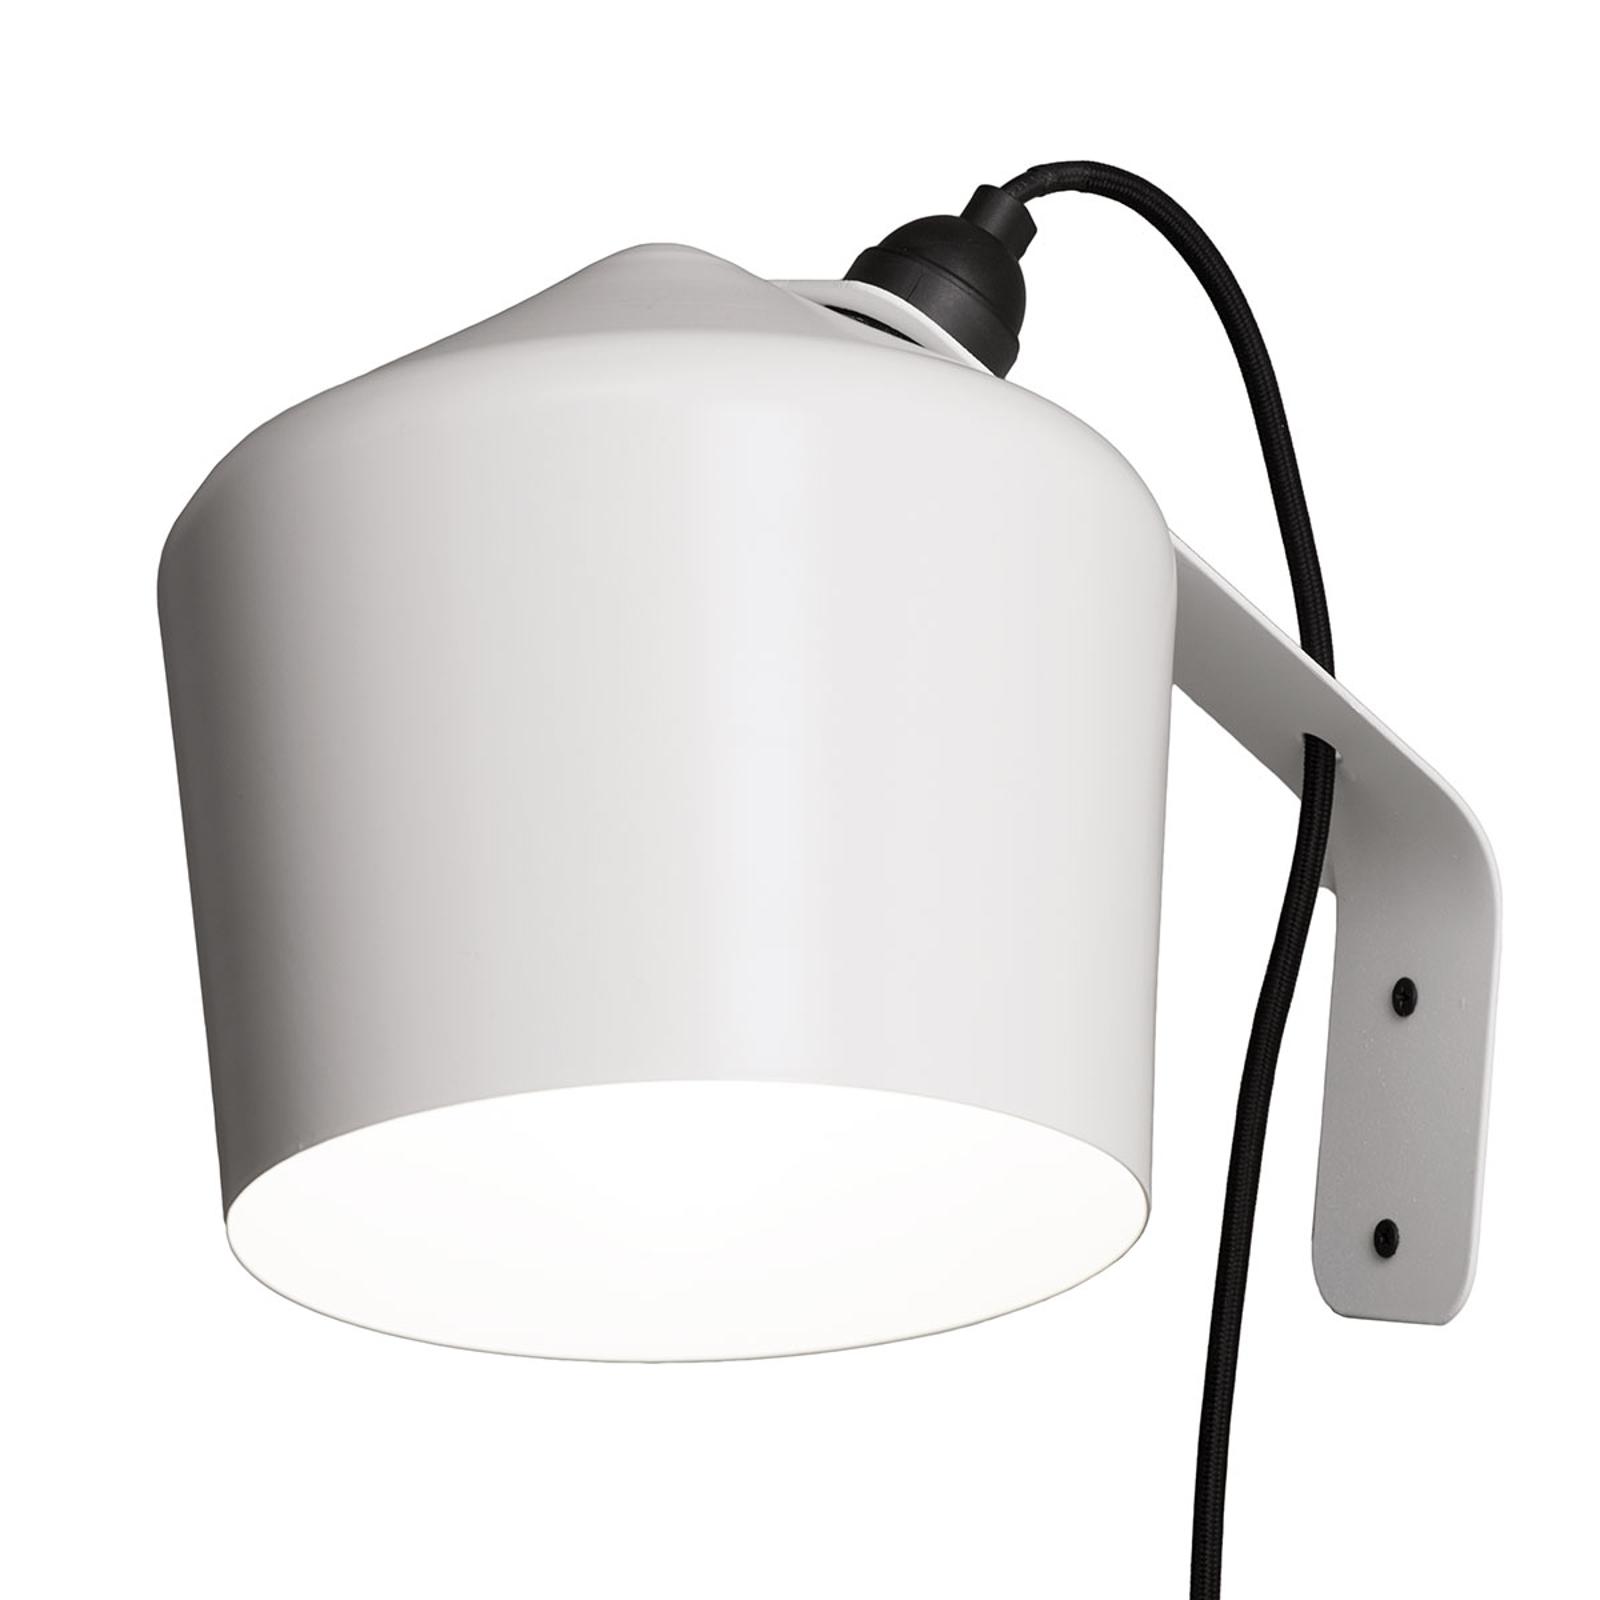 Innolux Pasila applique di design, bianca